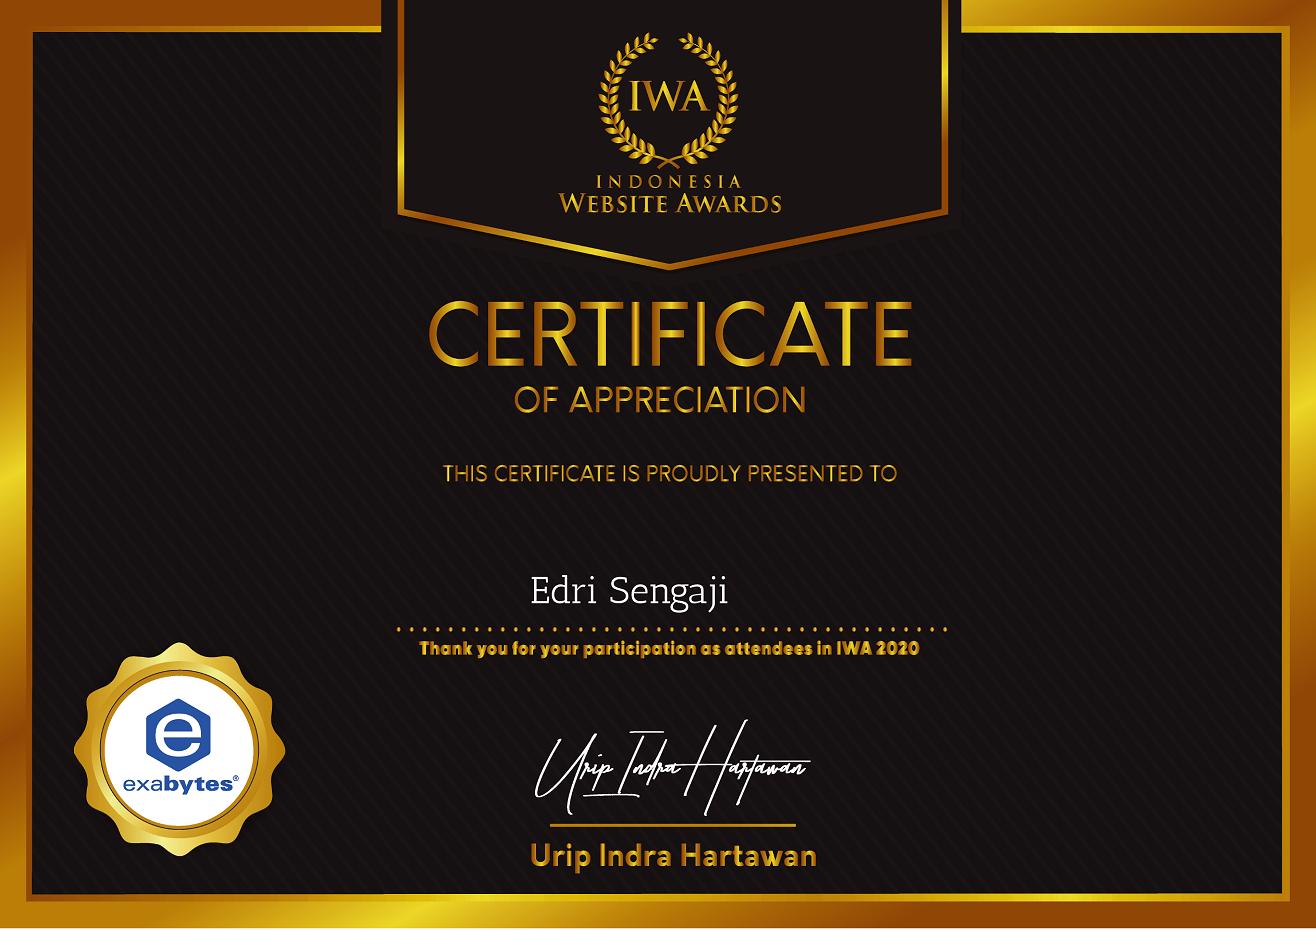 Edri Sengaji-IWA 2020 Announcement & Web Developer Talk (2)_1